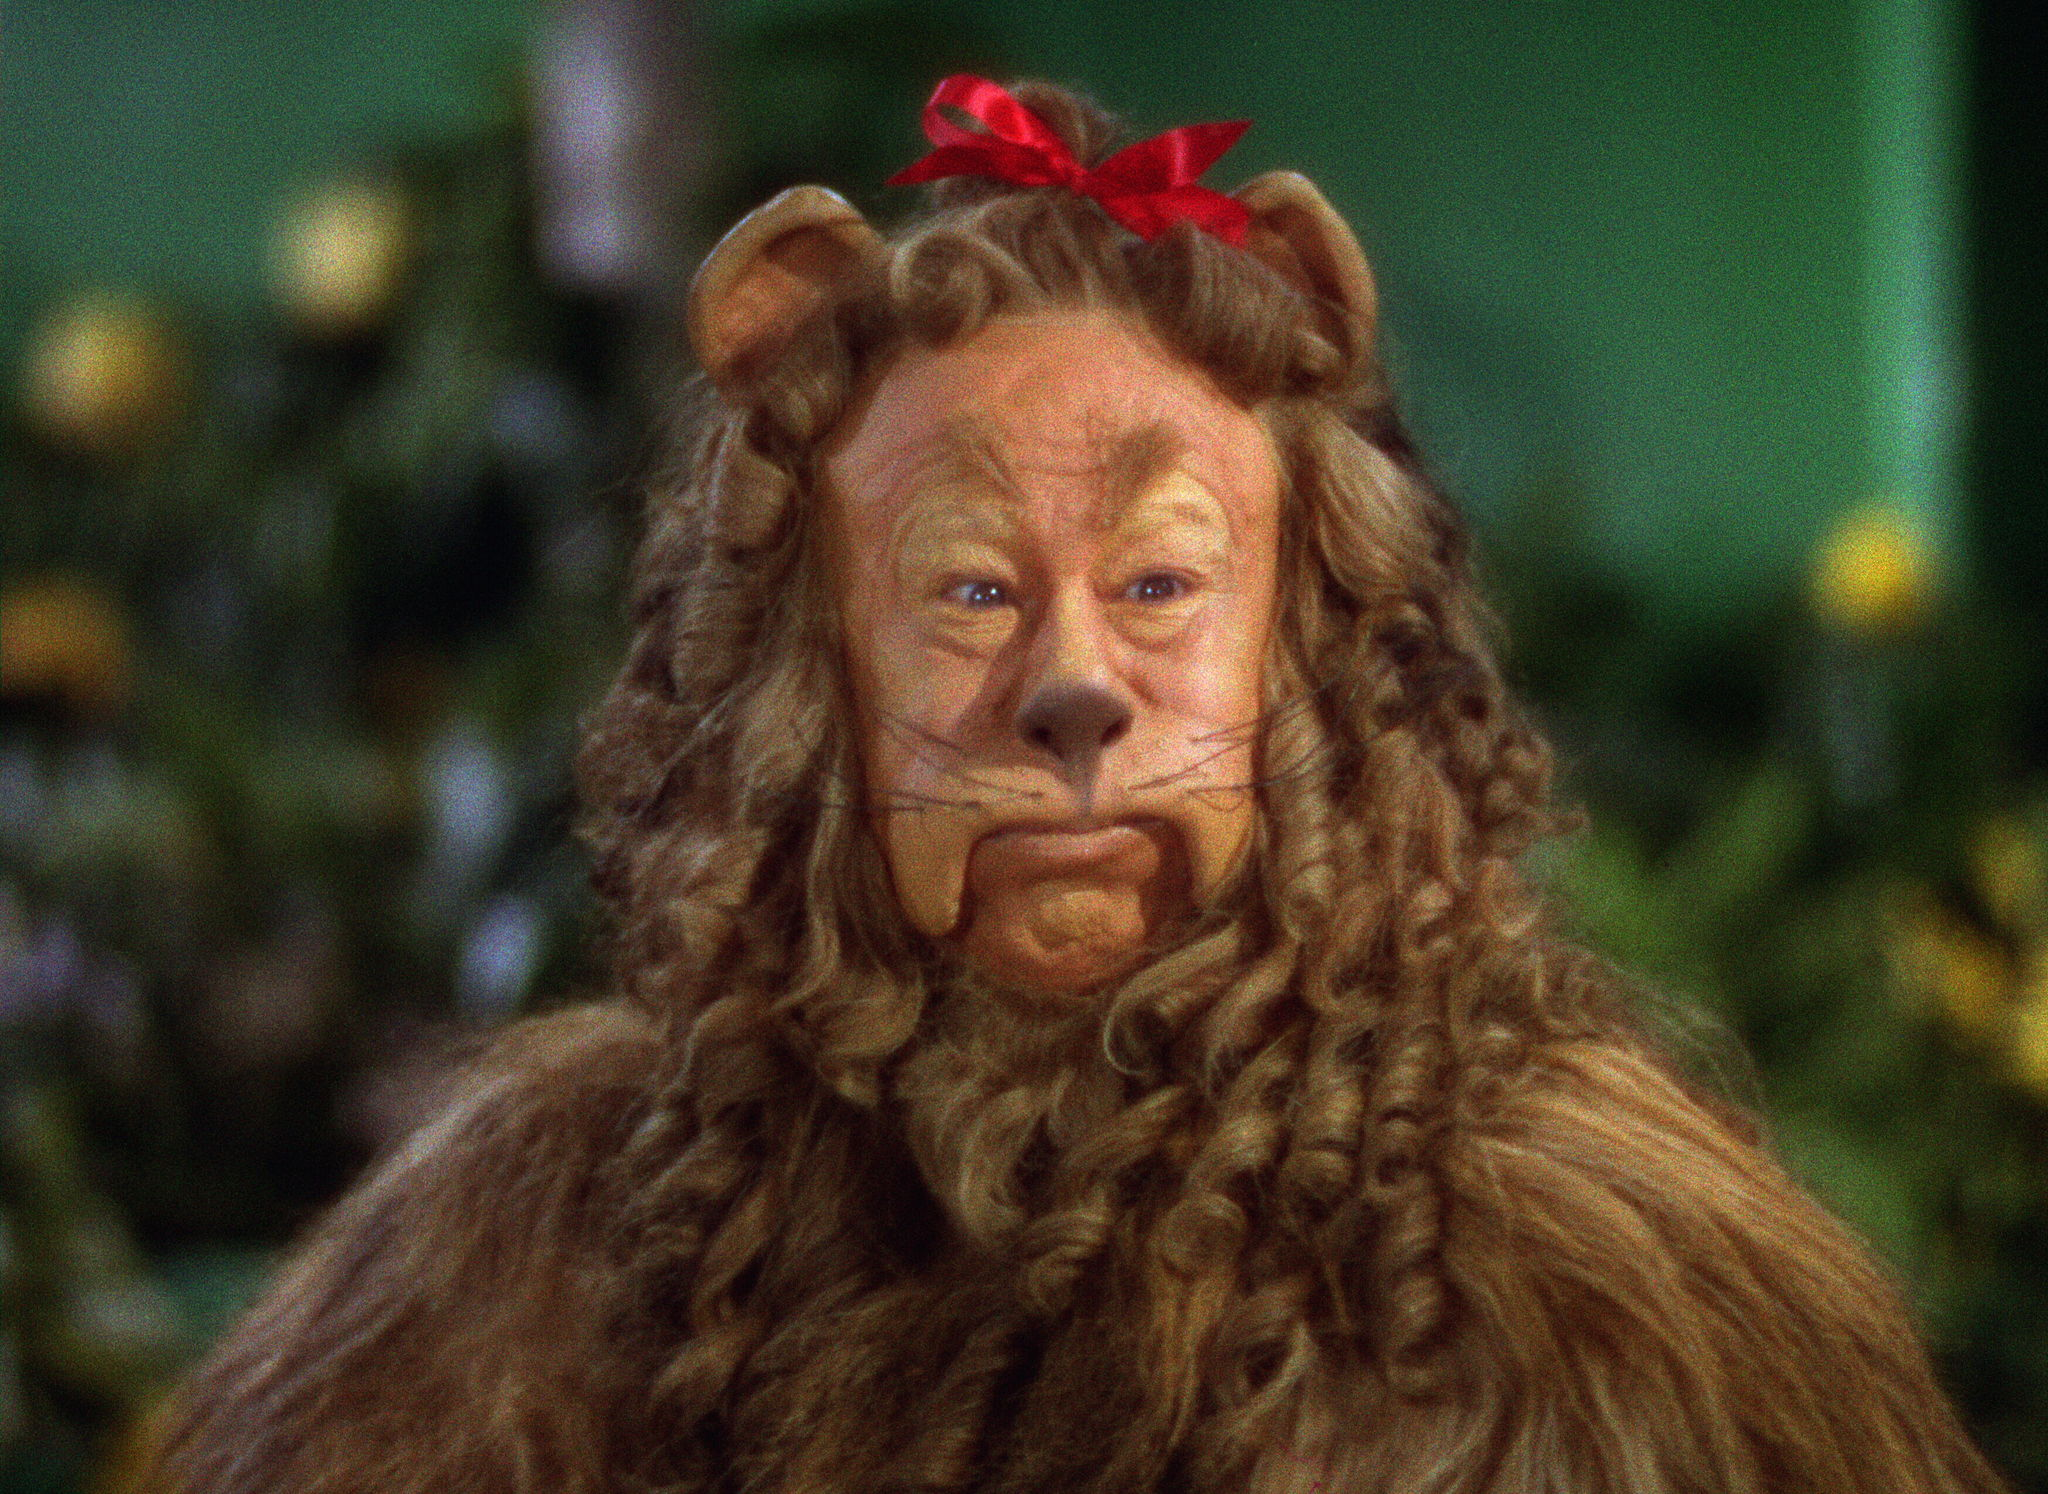 Still of Bert Lahr in The Wizard of Oz (1939)